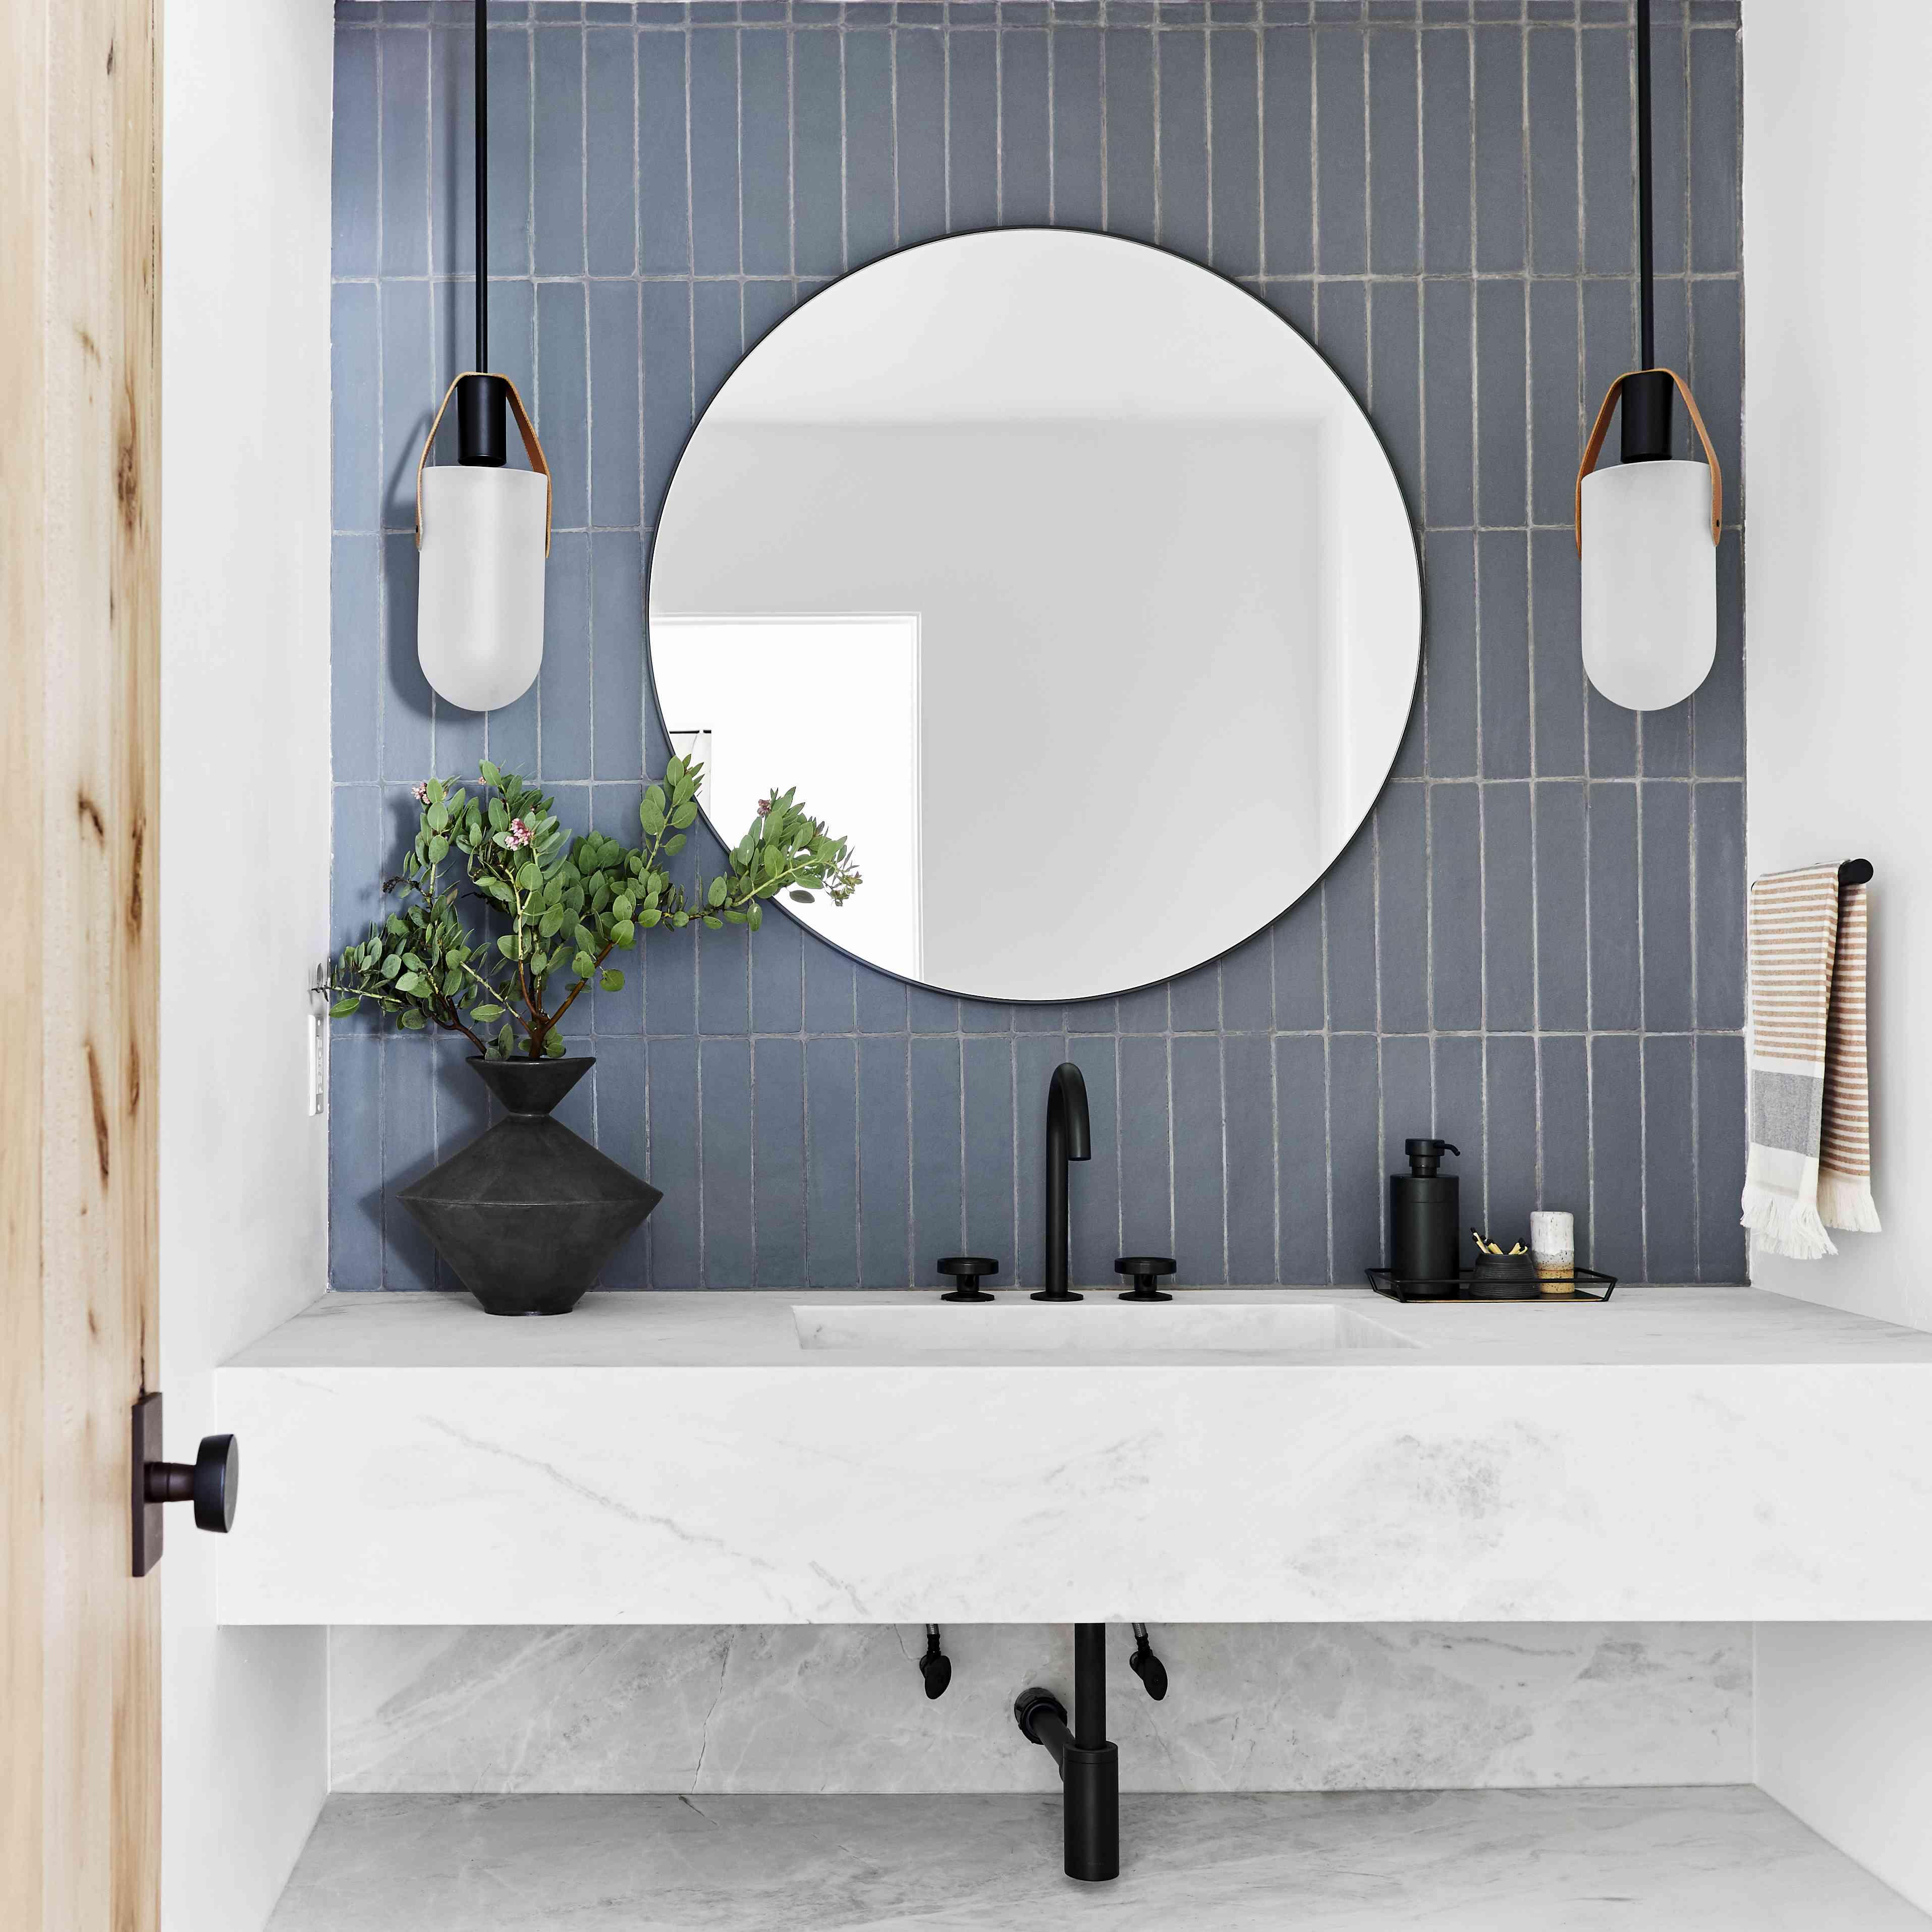 how to clean a mirror - clean round mirror in bright bathroom